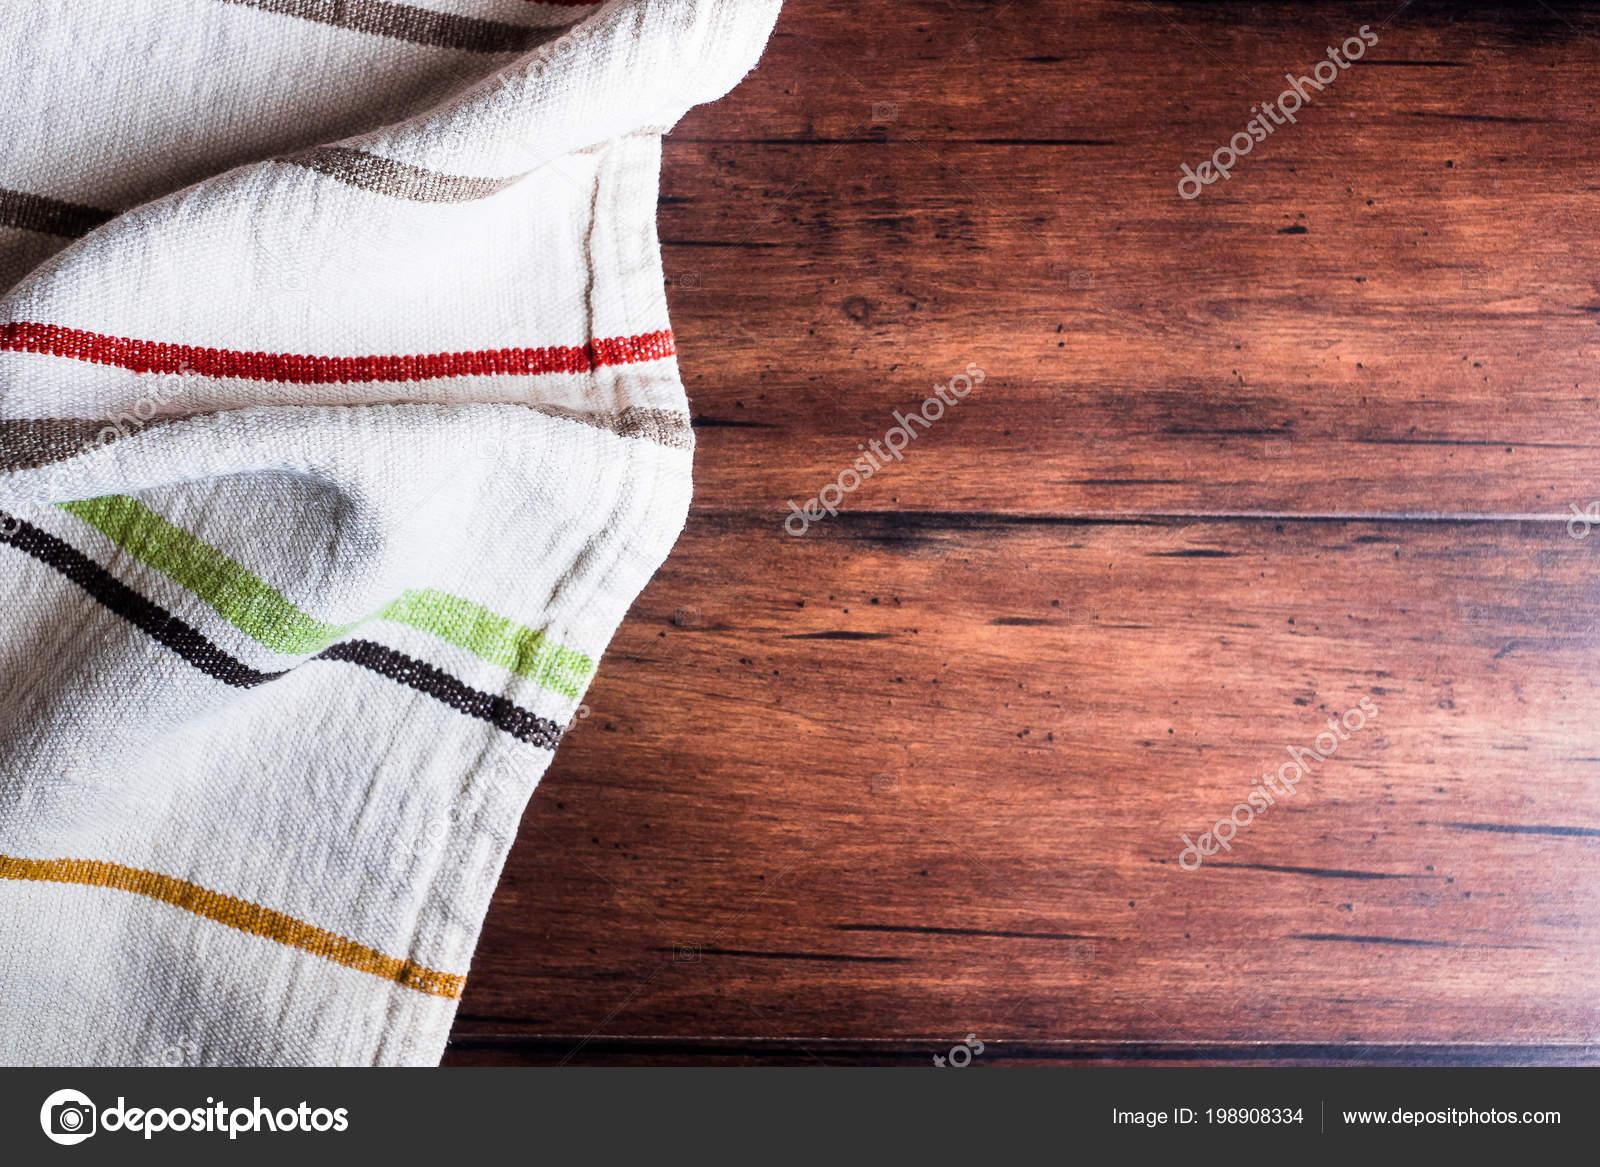 kitchen linens stores 彩色条纹亚麻布在老木褐色背景顶部视图具有复制空间的图像带有复制空间的 彩色条纹亚麻布在老木褐色背景 顶部视图 具有复制空间的图像 带有复制空间的毛巾顶部视图的厨房表 照片作者anna mavritta